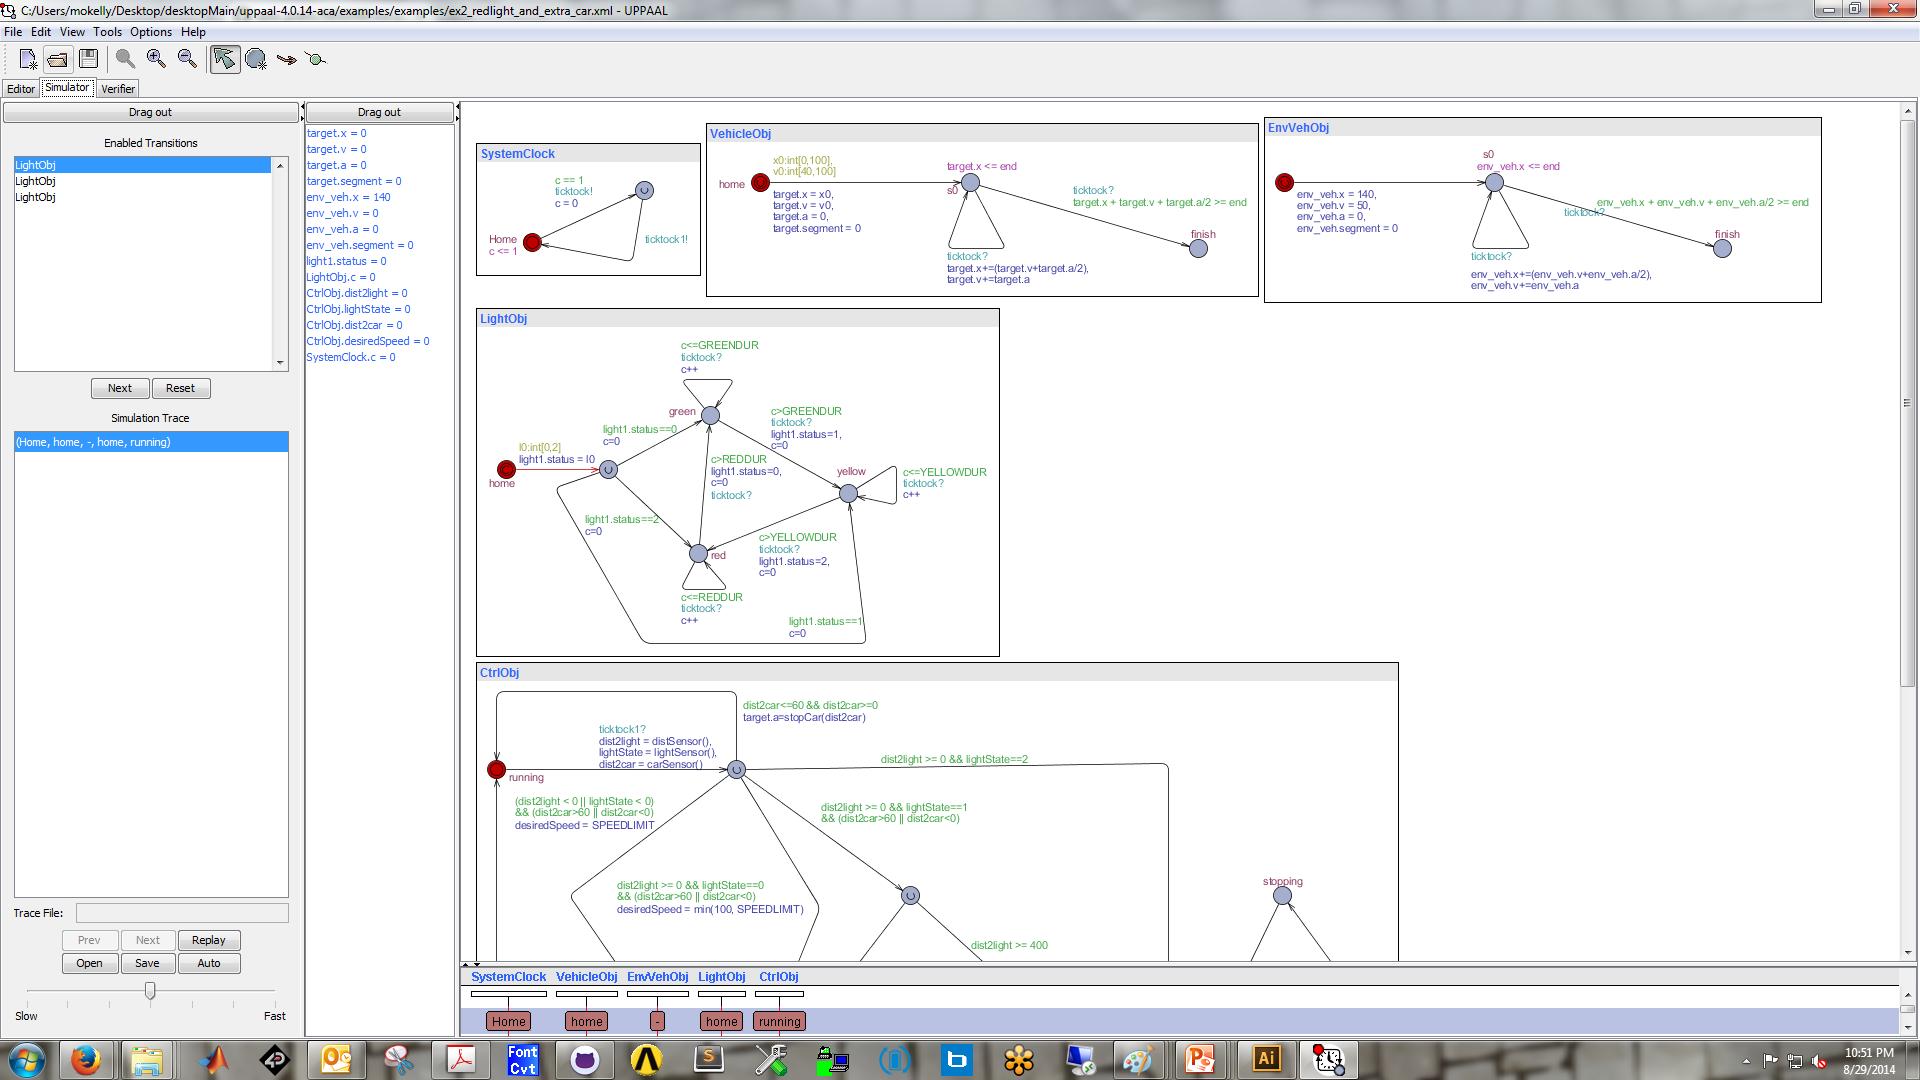 Github Mlab Upenn Apex Traffic Light State Diagram Alt Tag